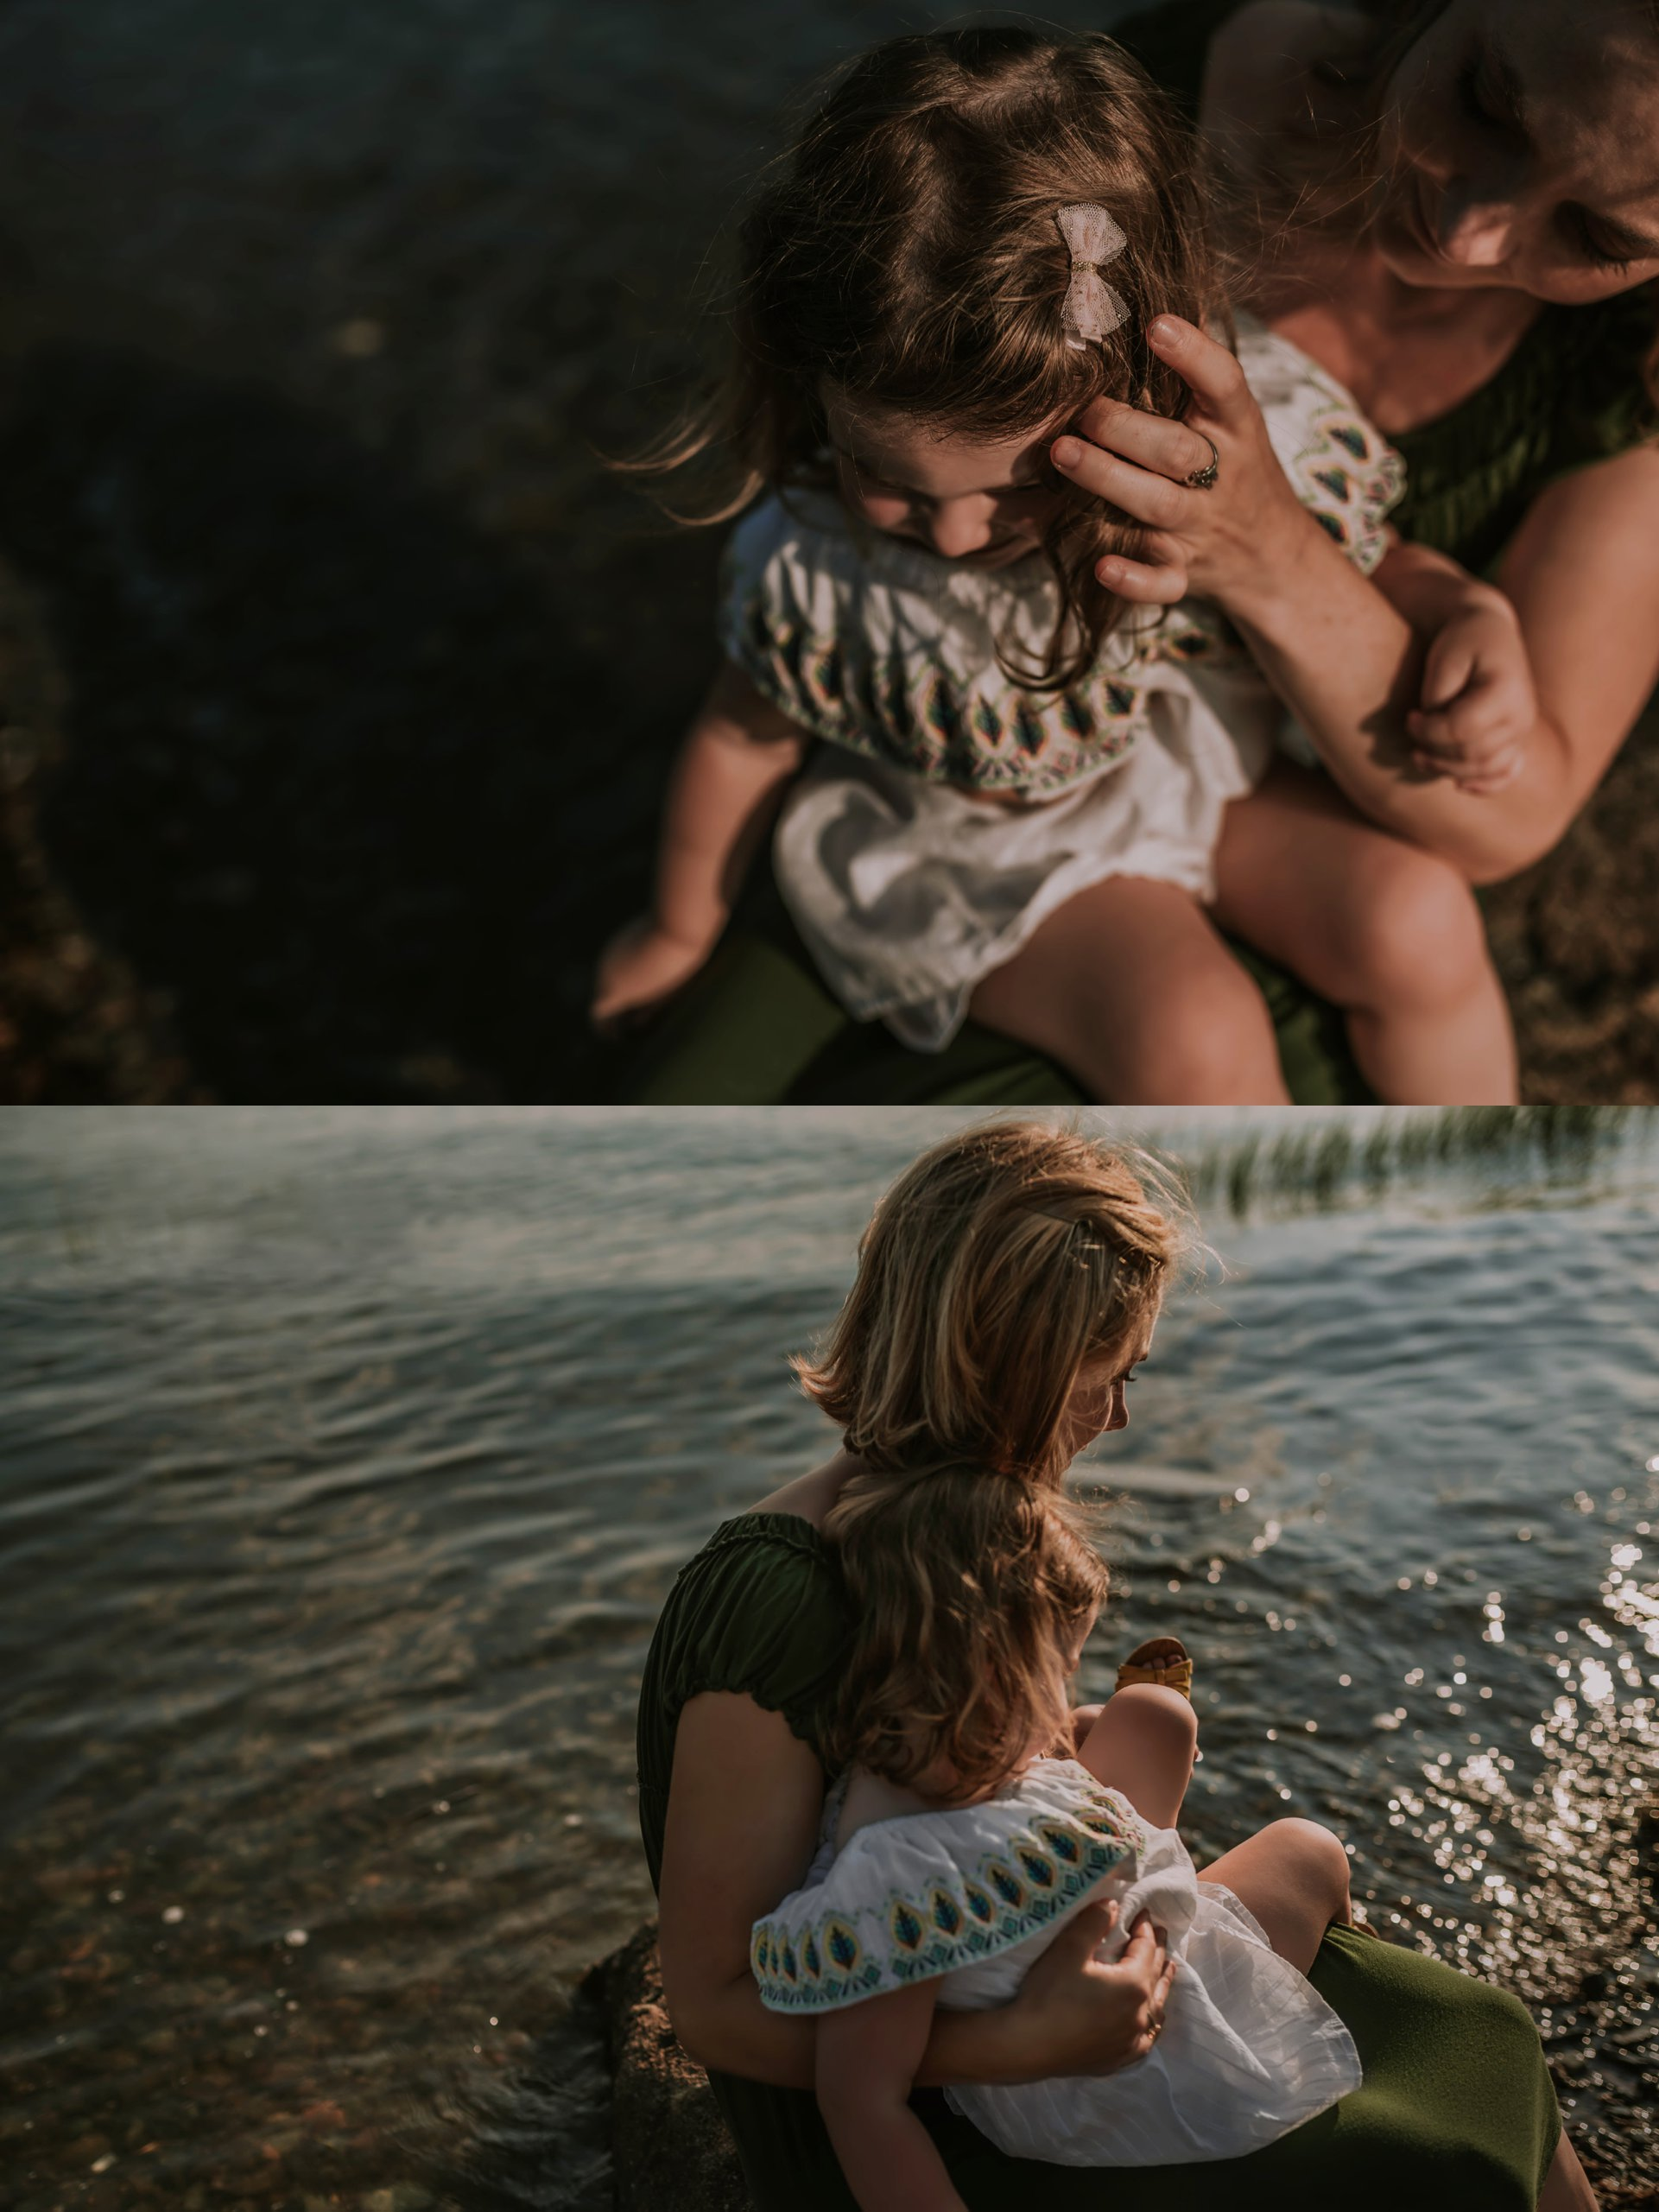 Summers_August_2018-121_Beautiful_Natural_Portraits_by_Award_Winning_Boston_Massachusetts_Family_Portrait_Photographer_Asher_and_Oak_Photography.jpg